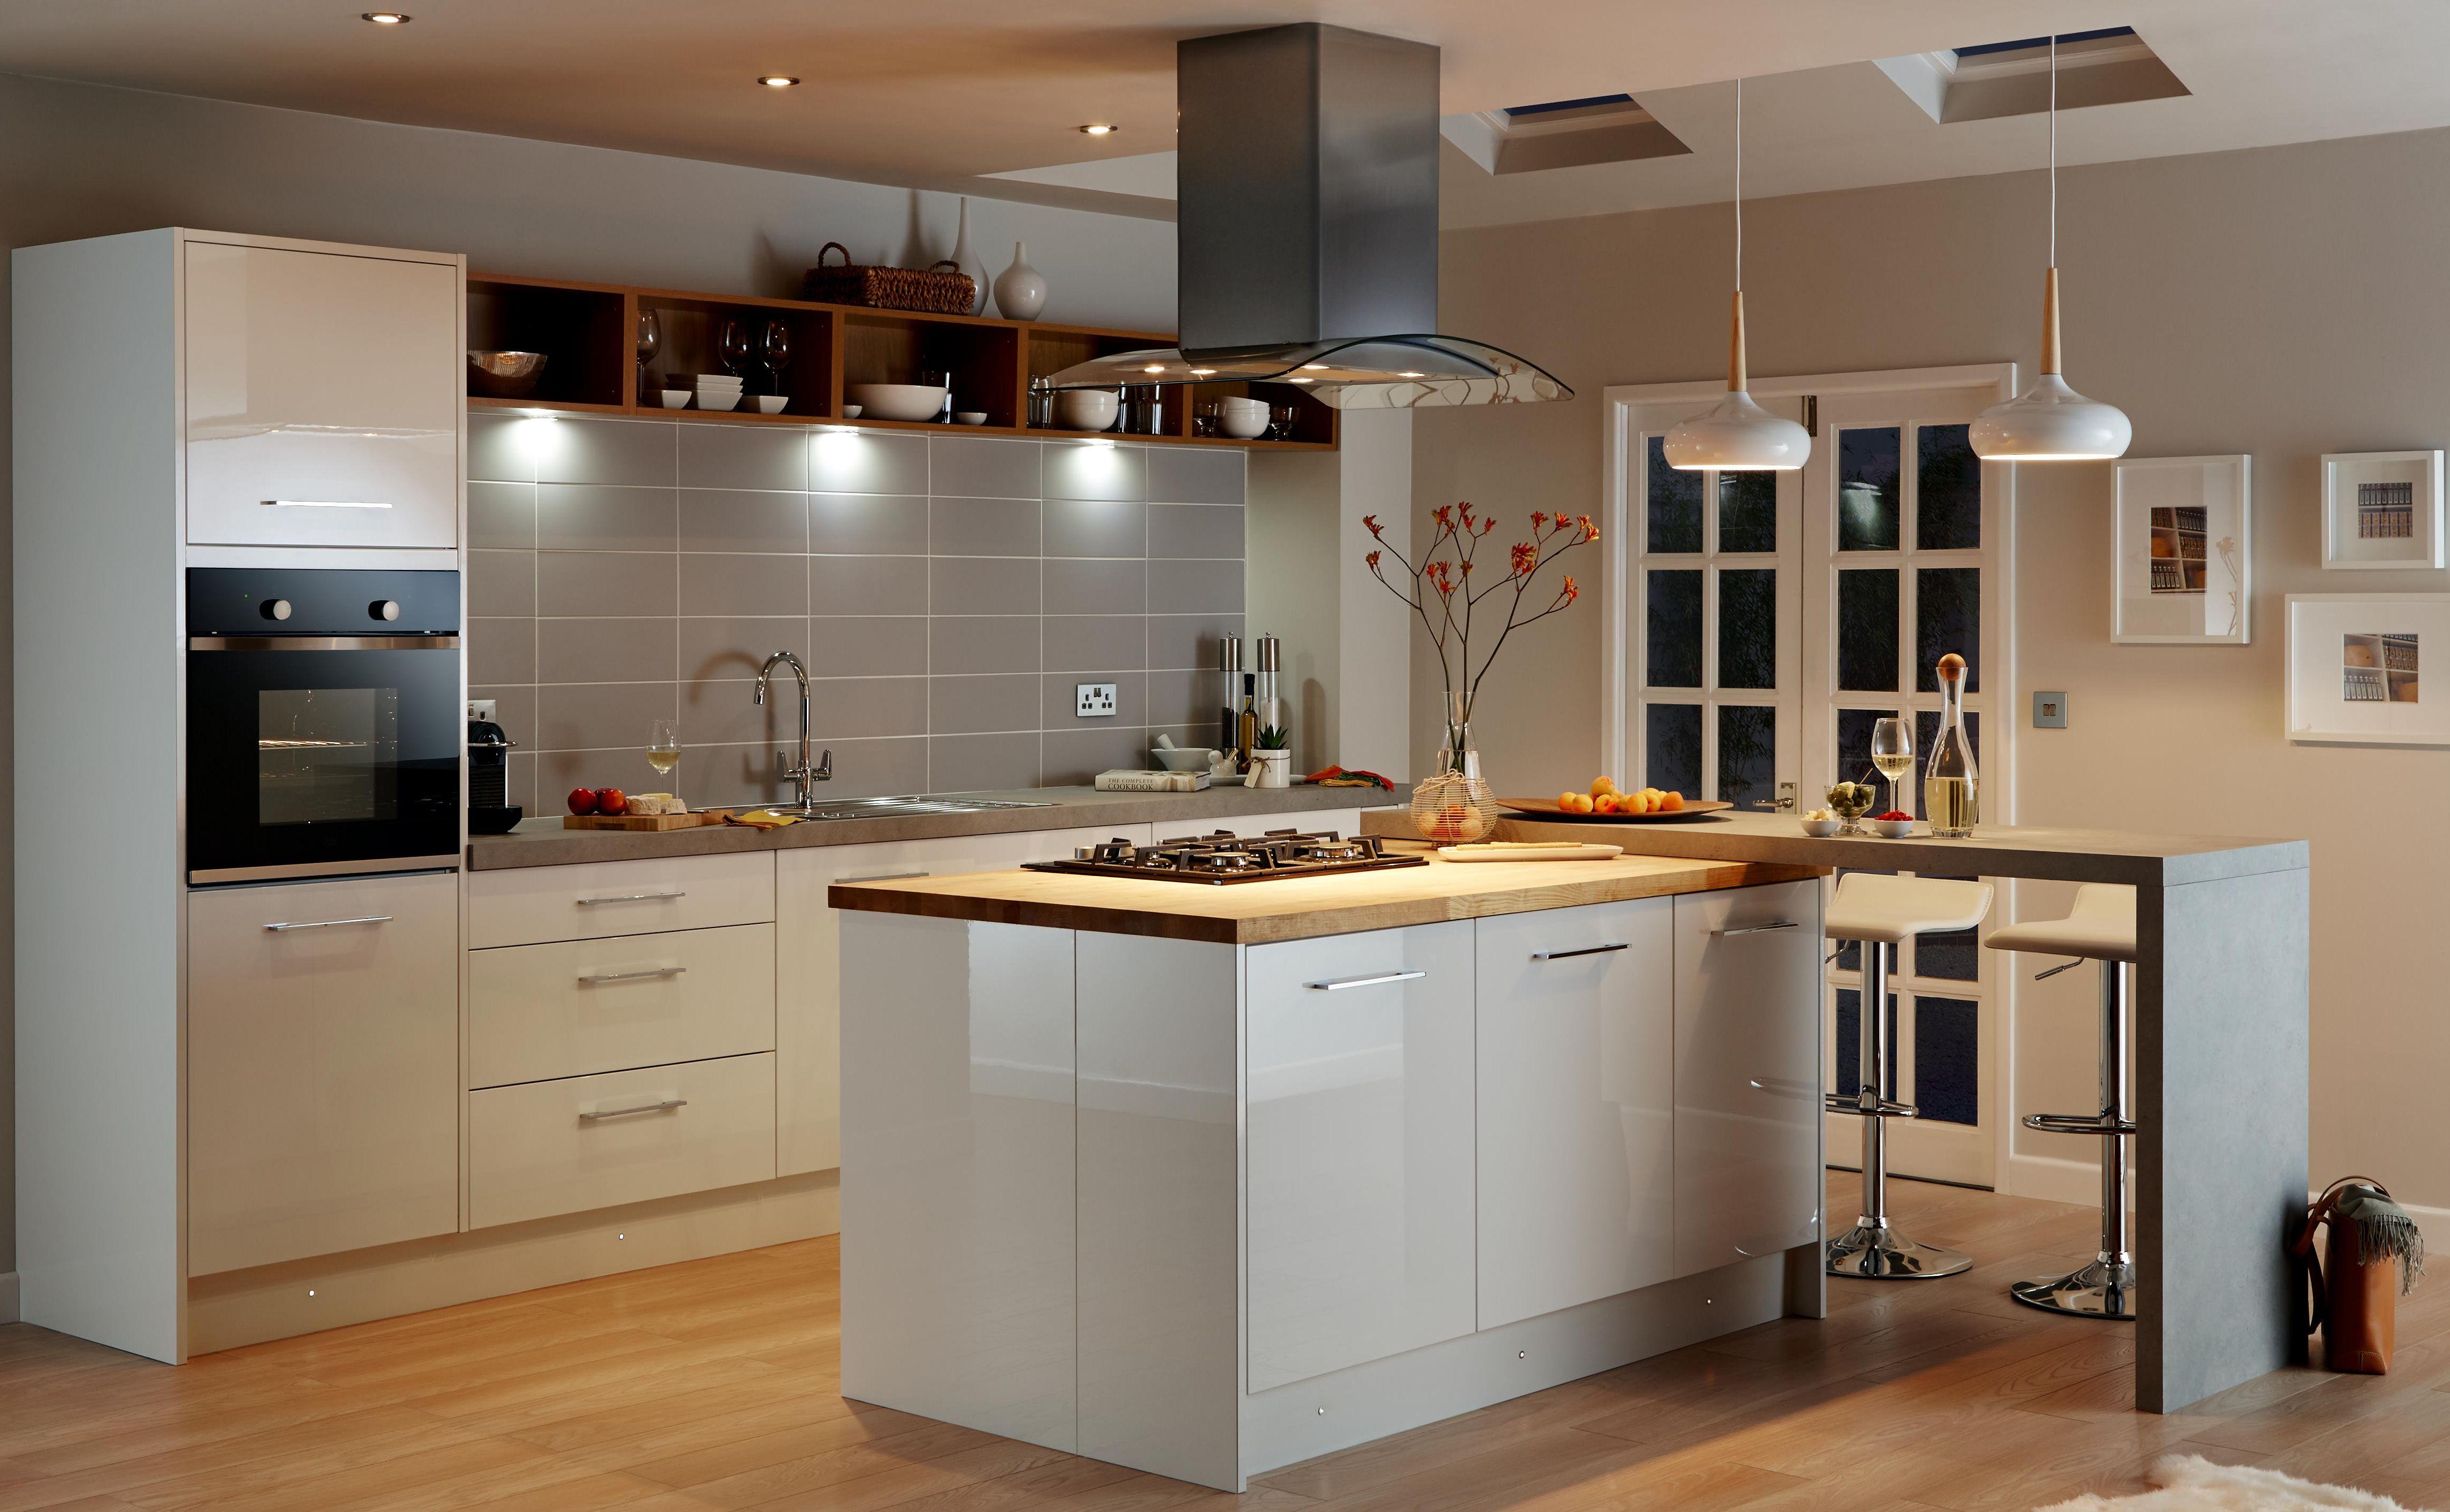 Kitchen Lighting Buying Guide Ideas Advice Diy At Bq